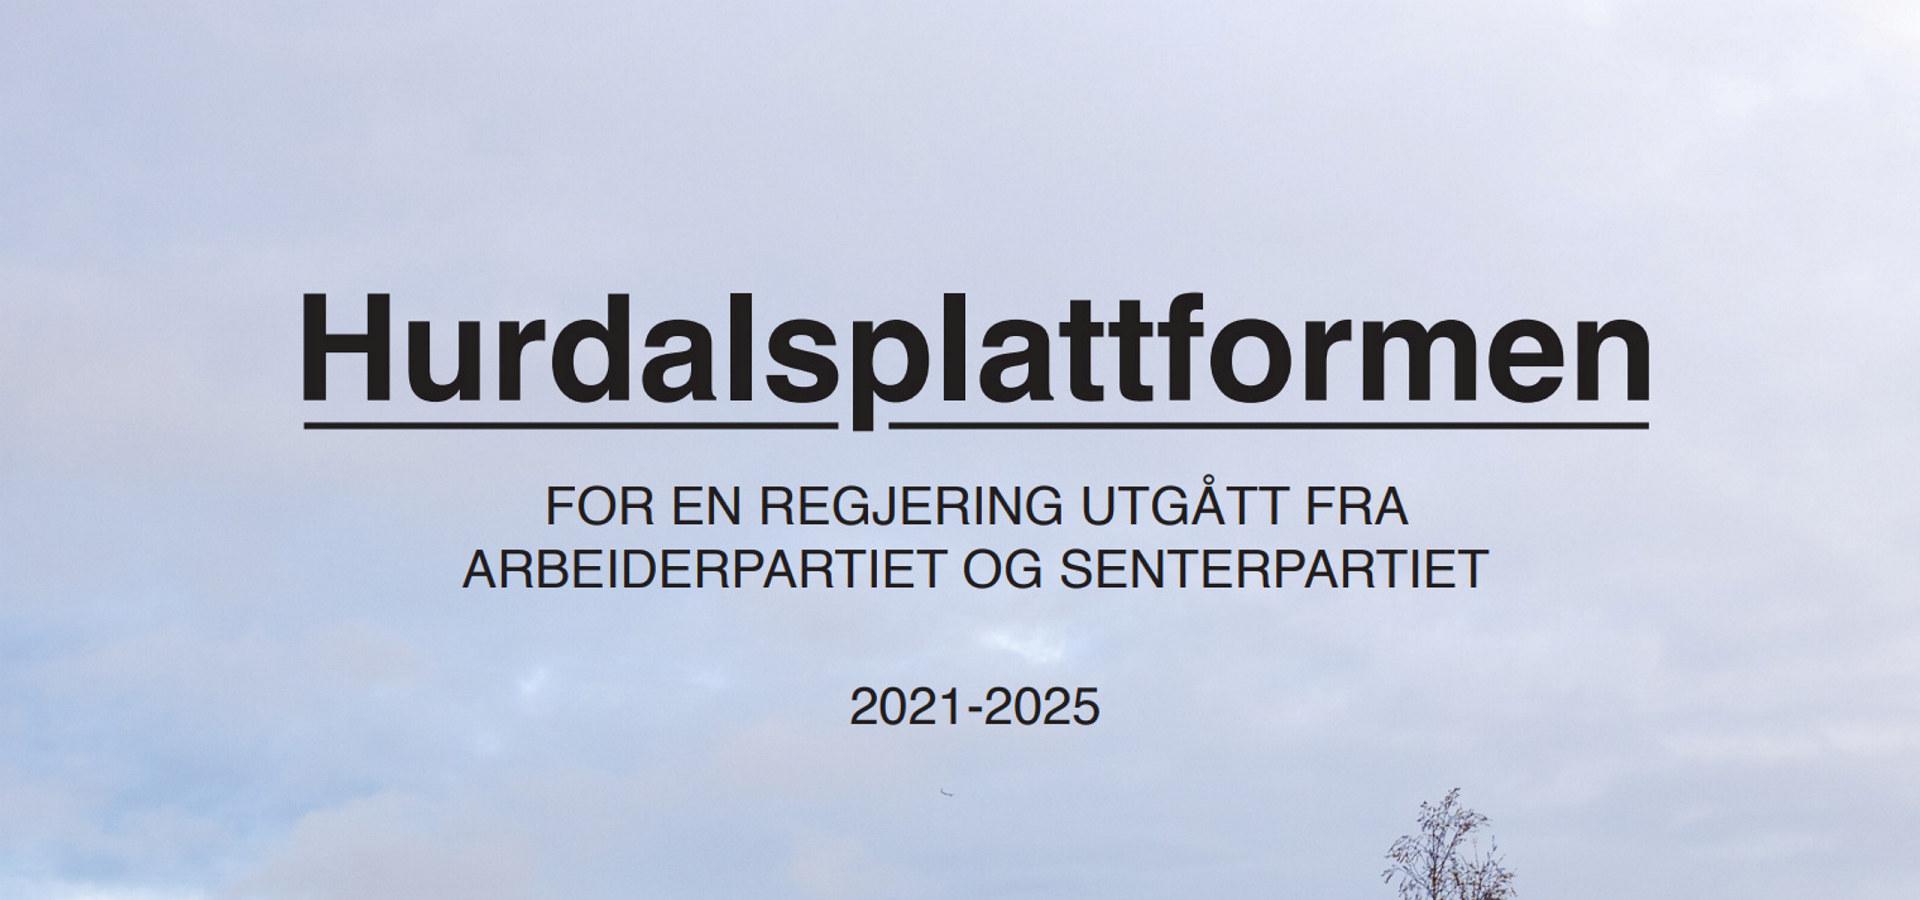 "Forside ""Hurdalsplattformen - For en regjering utgått fra Arbeiderpartiet og Senterpartiet 2021-2025"""